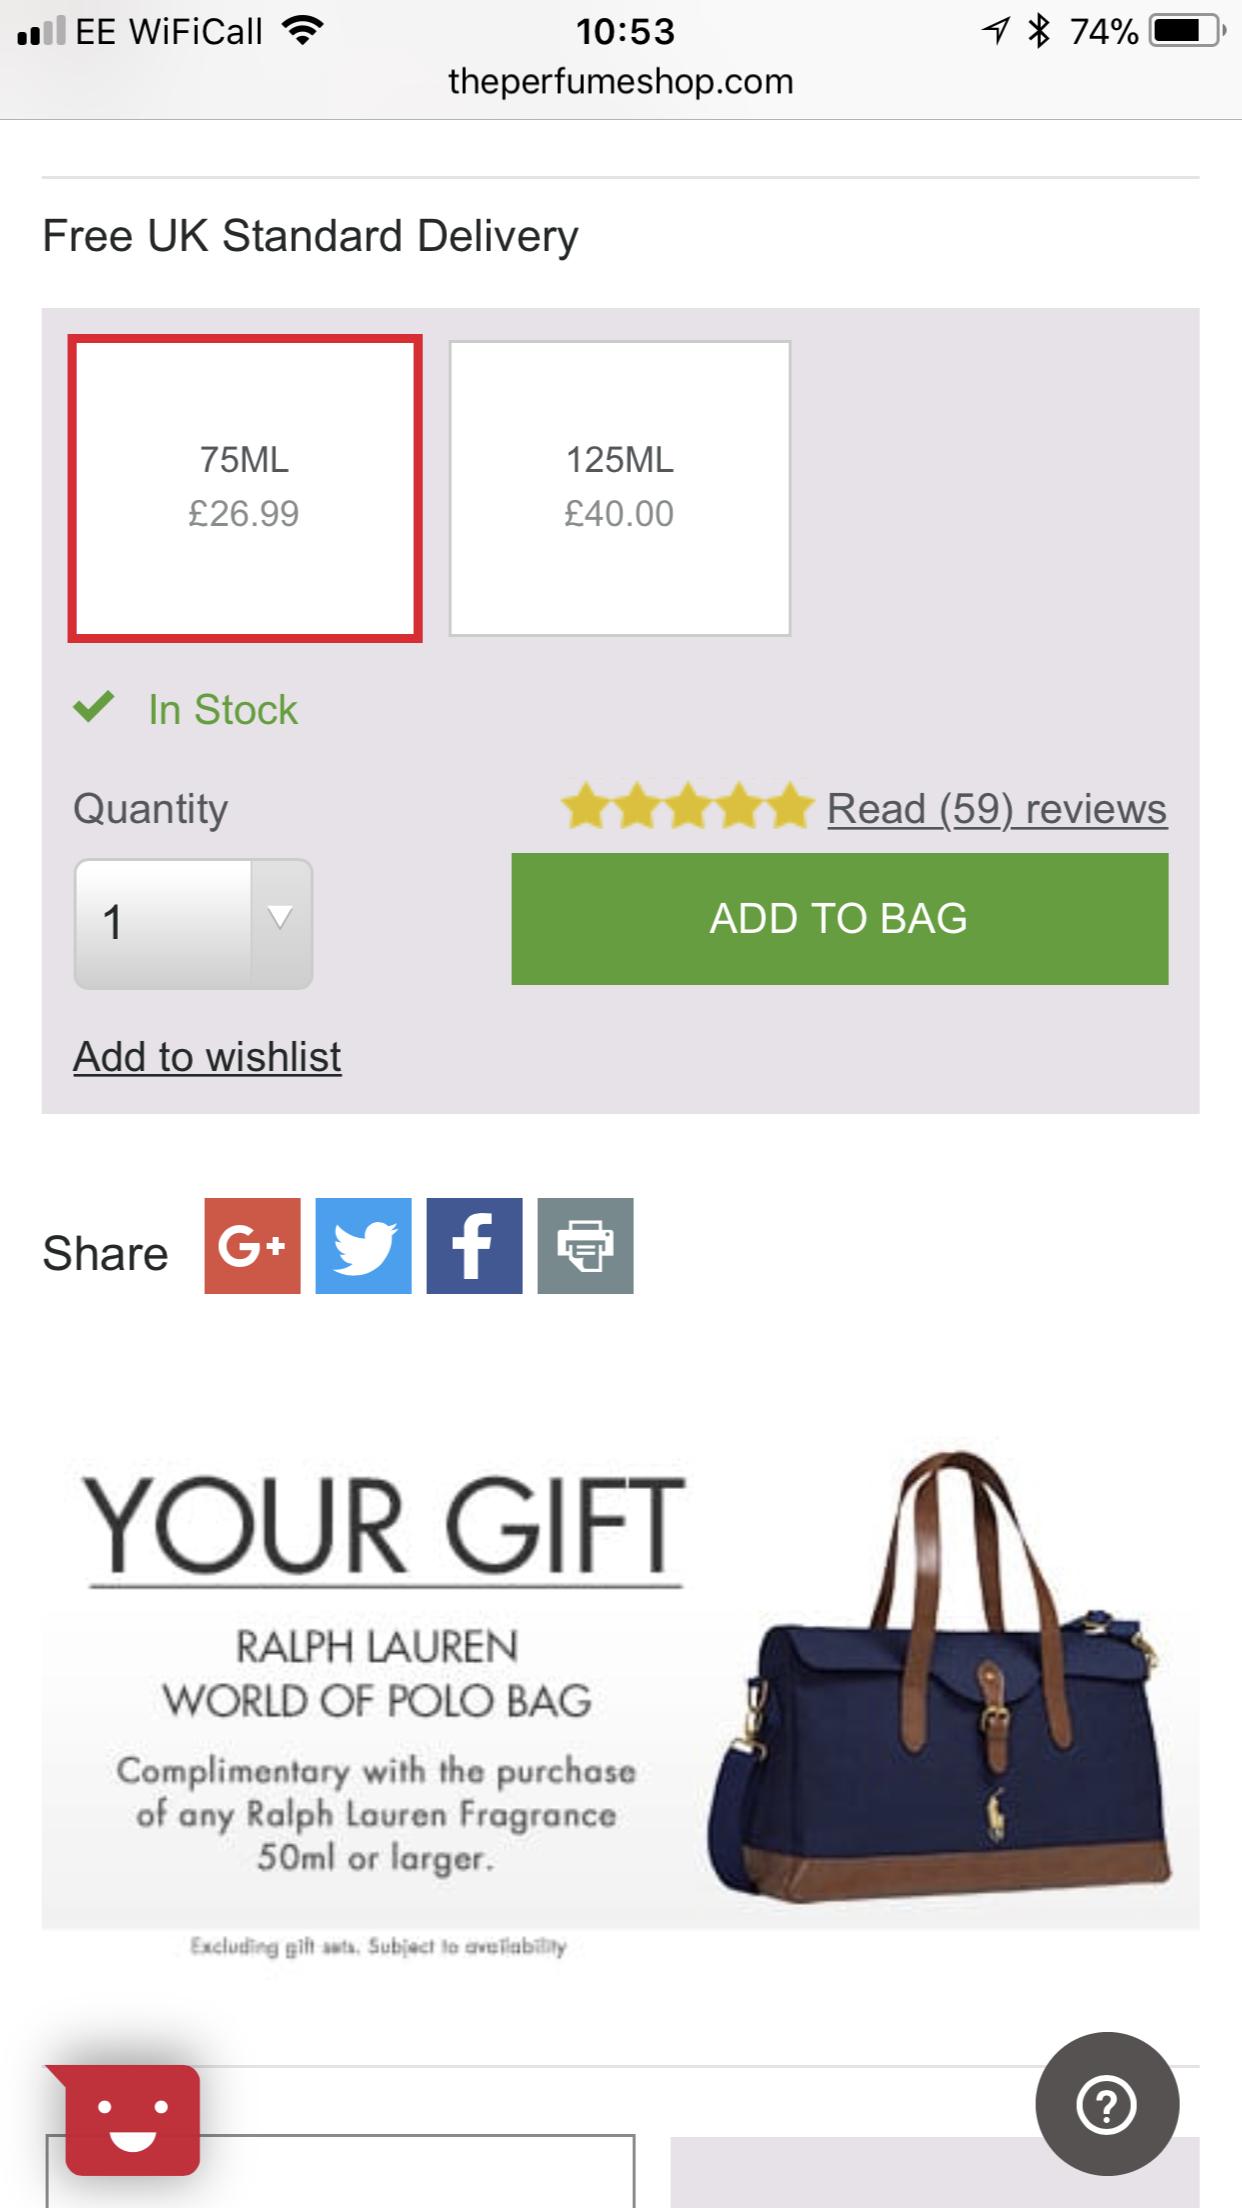 The perfume shop. Ralph Lauren safari 75ml with free polo duffle bag. - £26.99